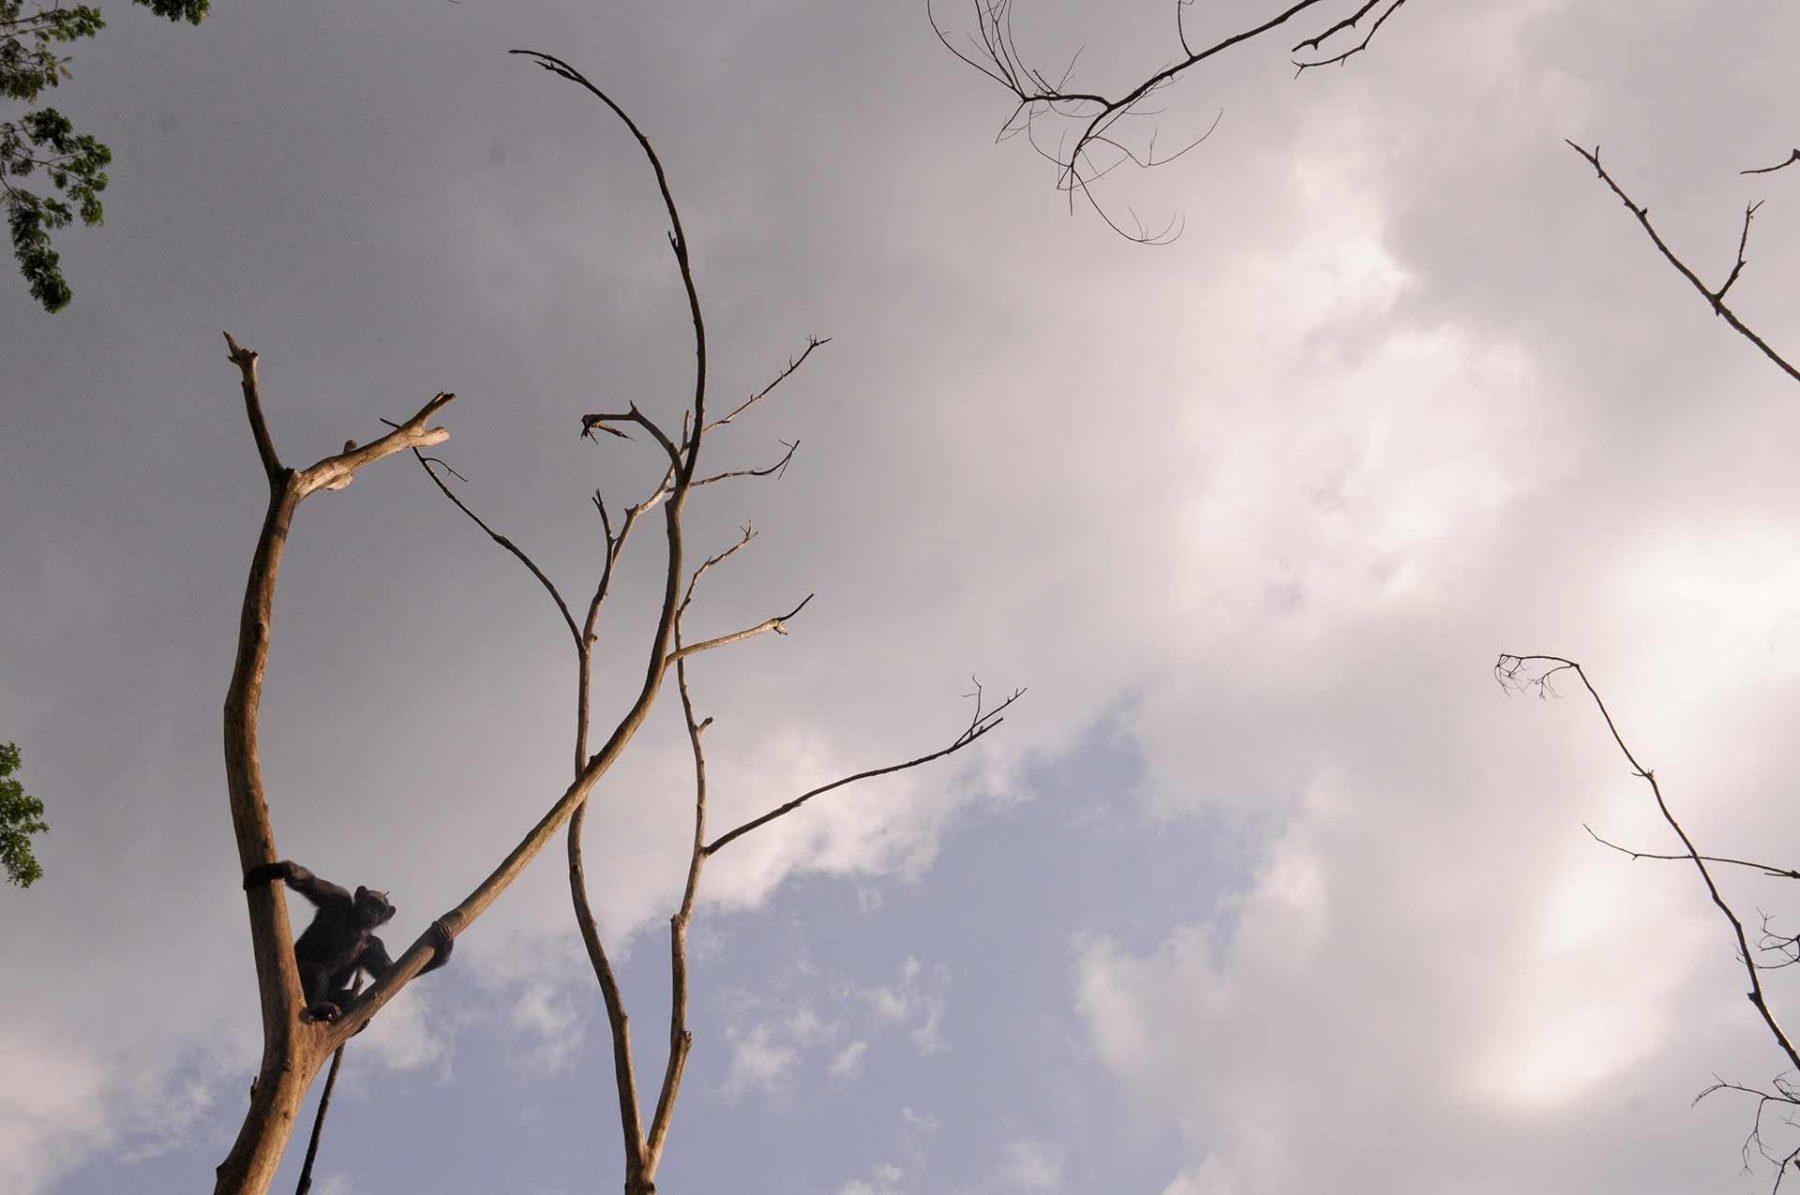 Evuna the chimpanzee, up a tree. Cameroon.